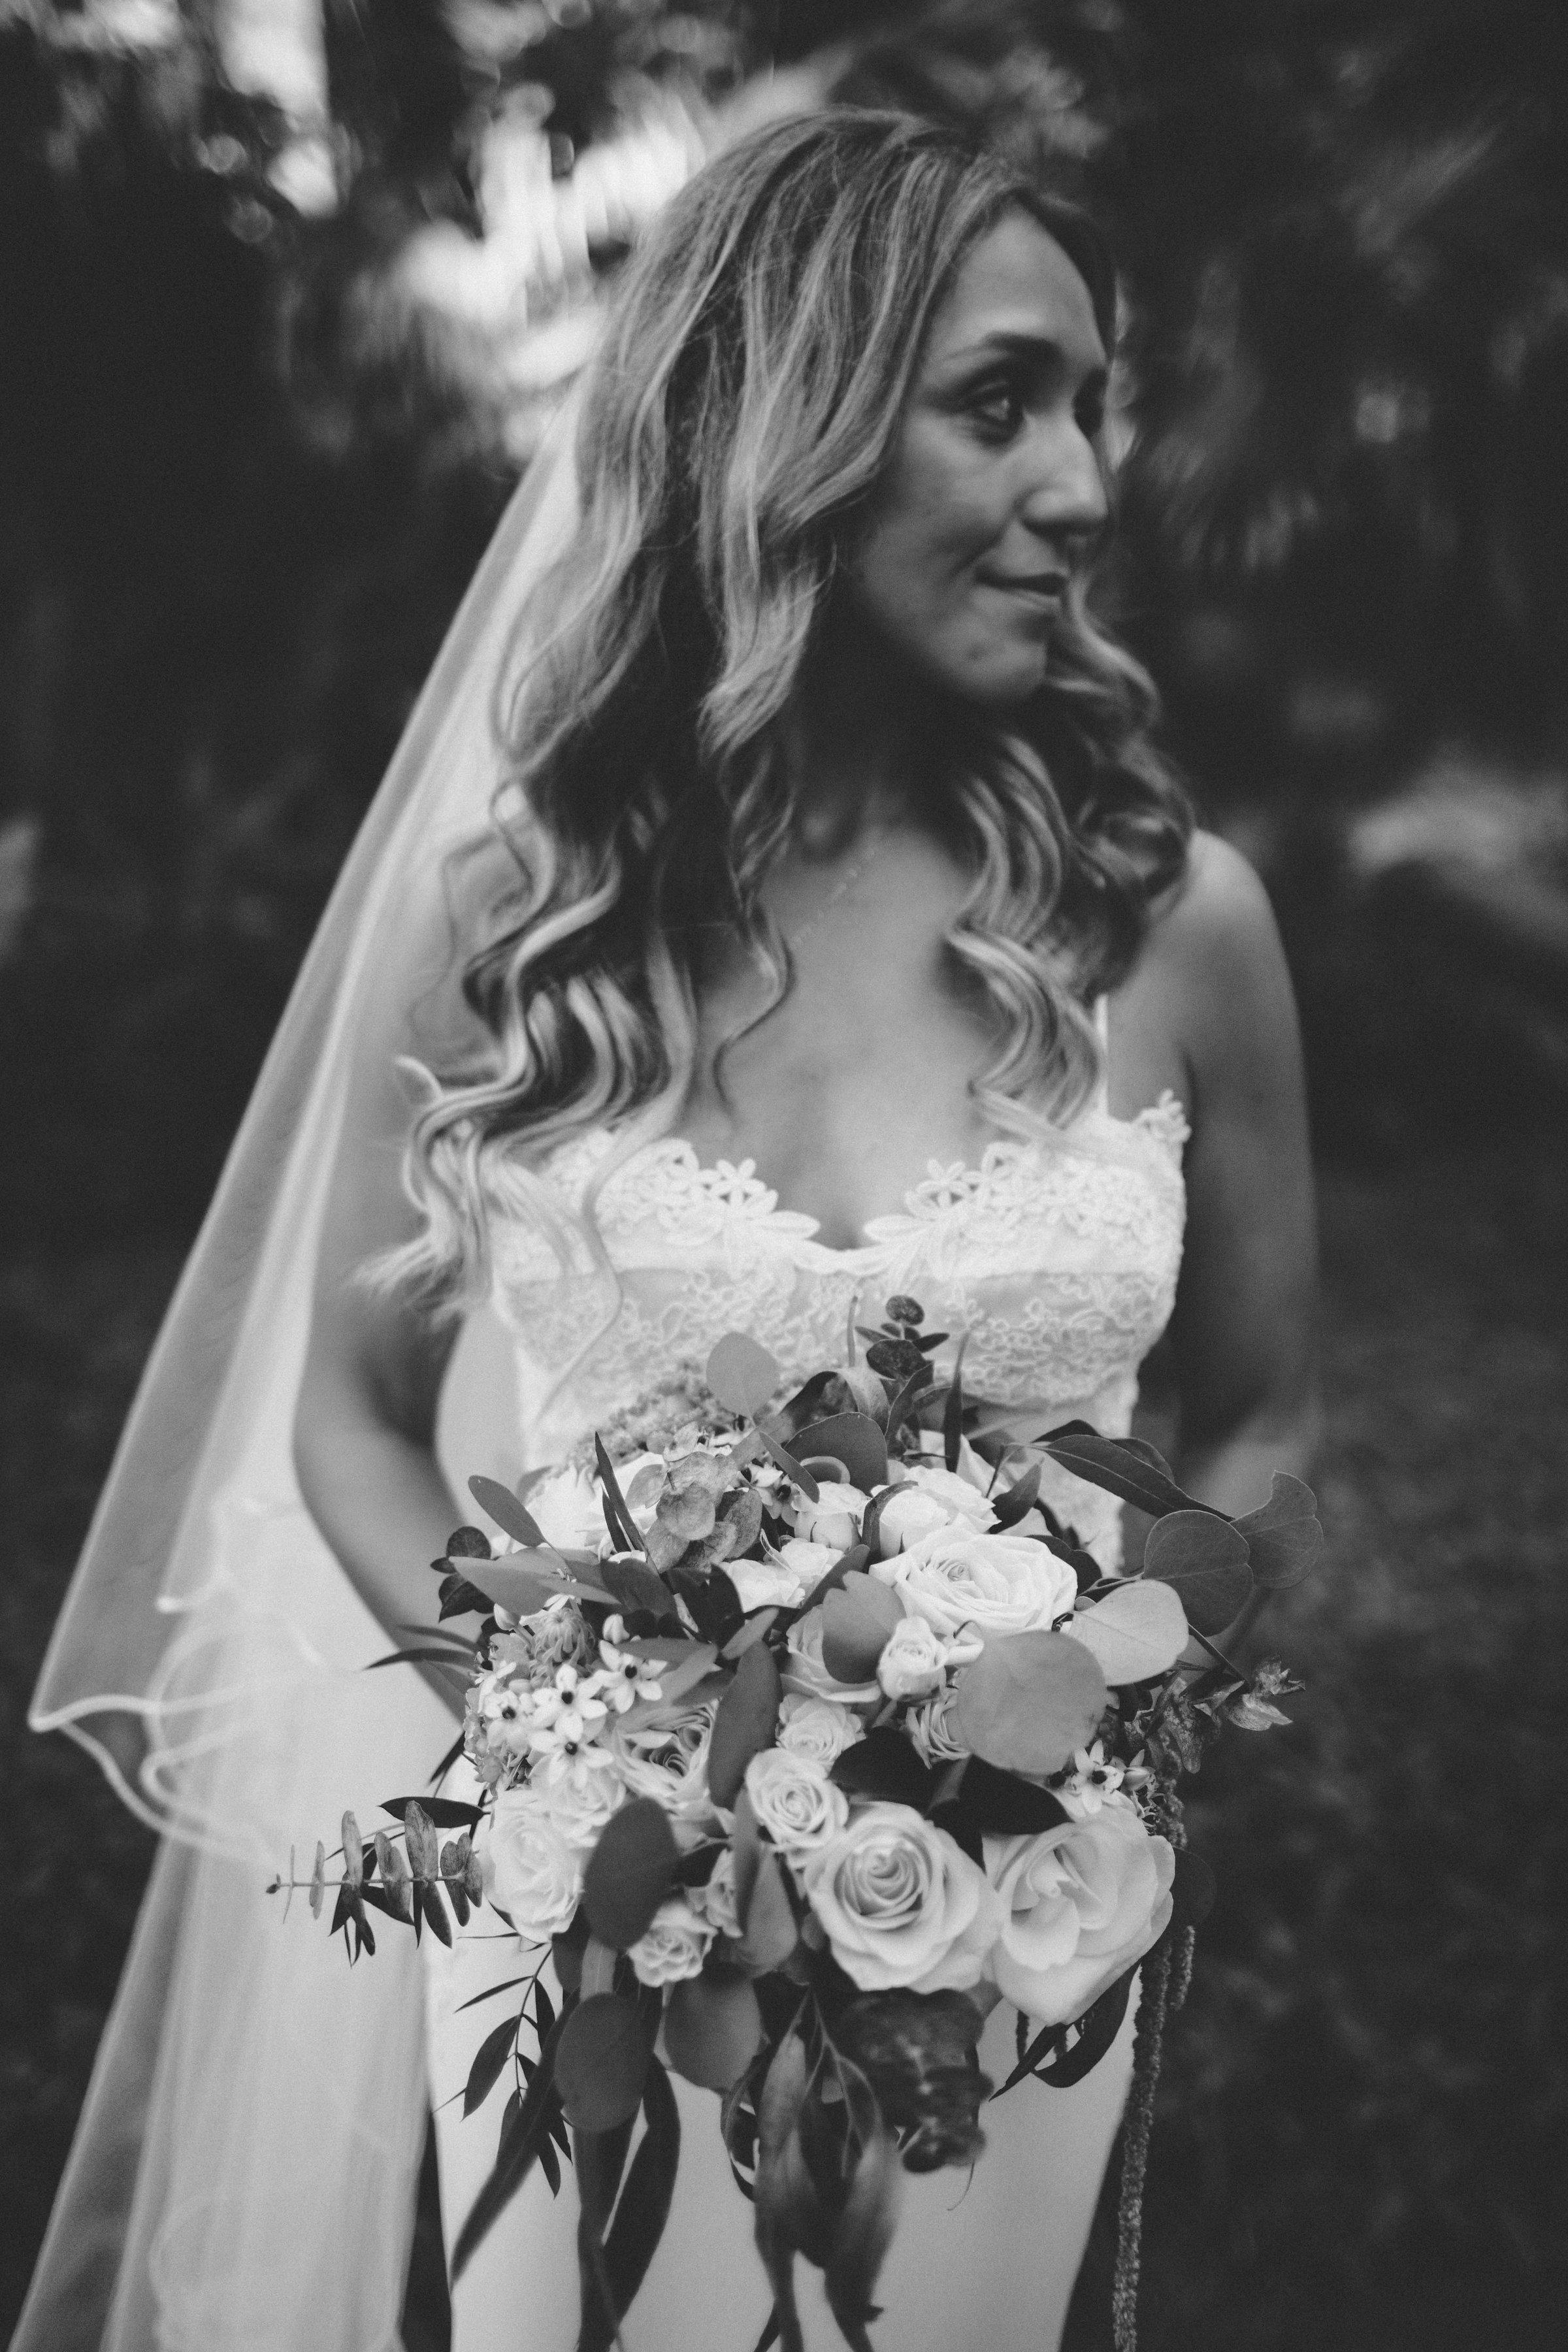 mexico_wedding_cancun_villa_la_joya_evangeline_lane_108a.jpg